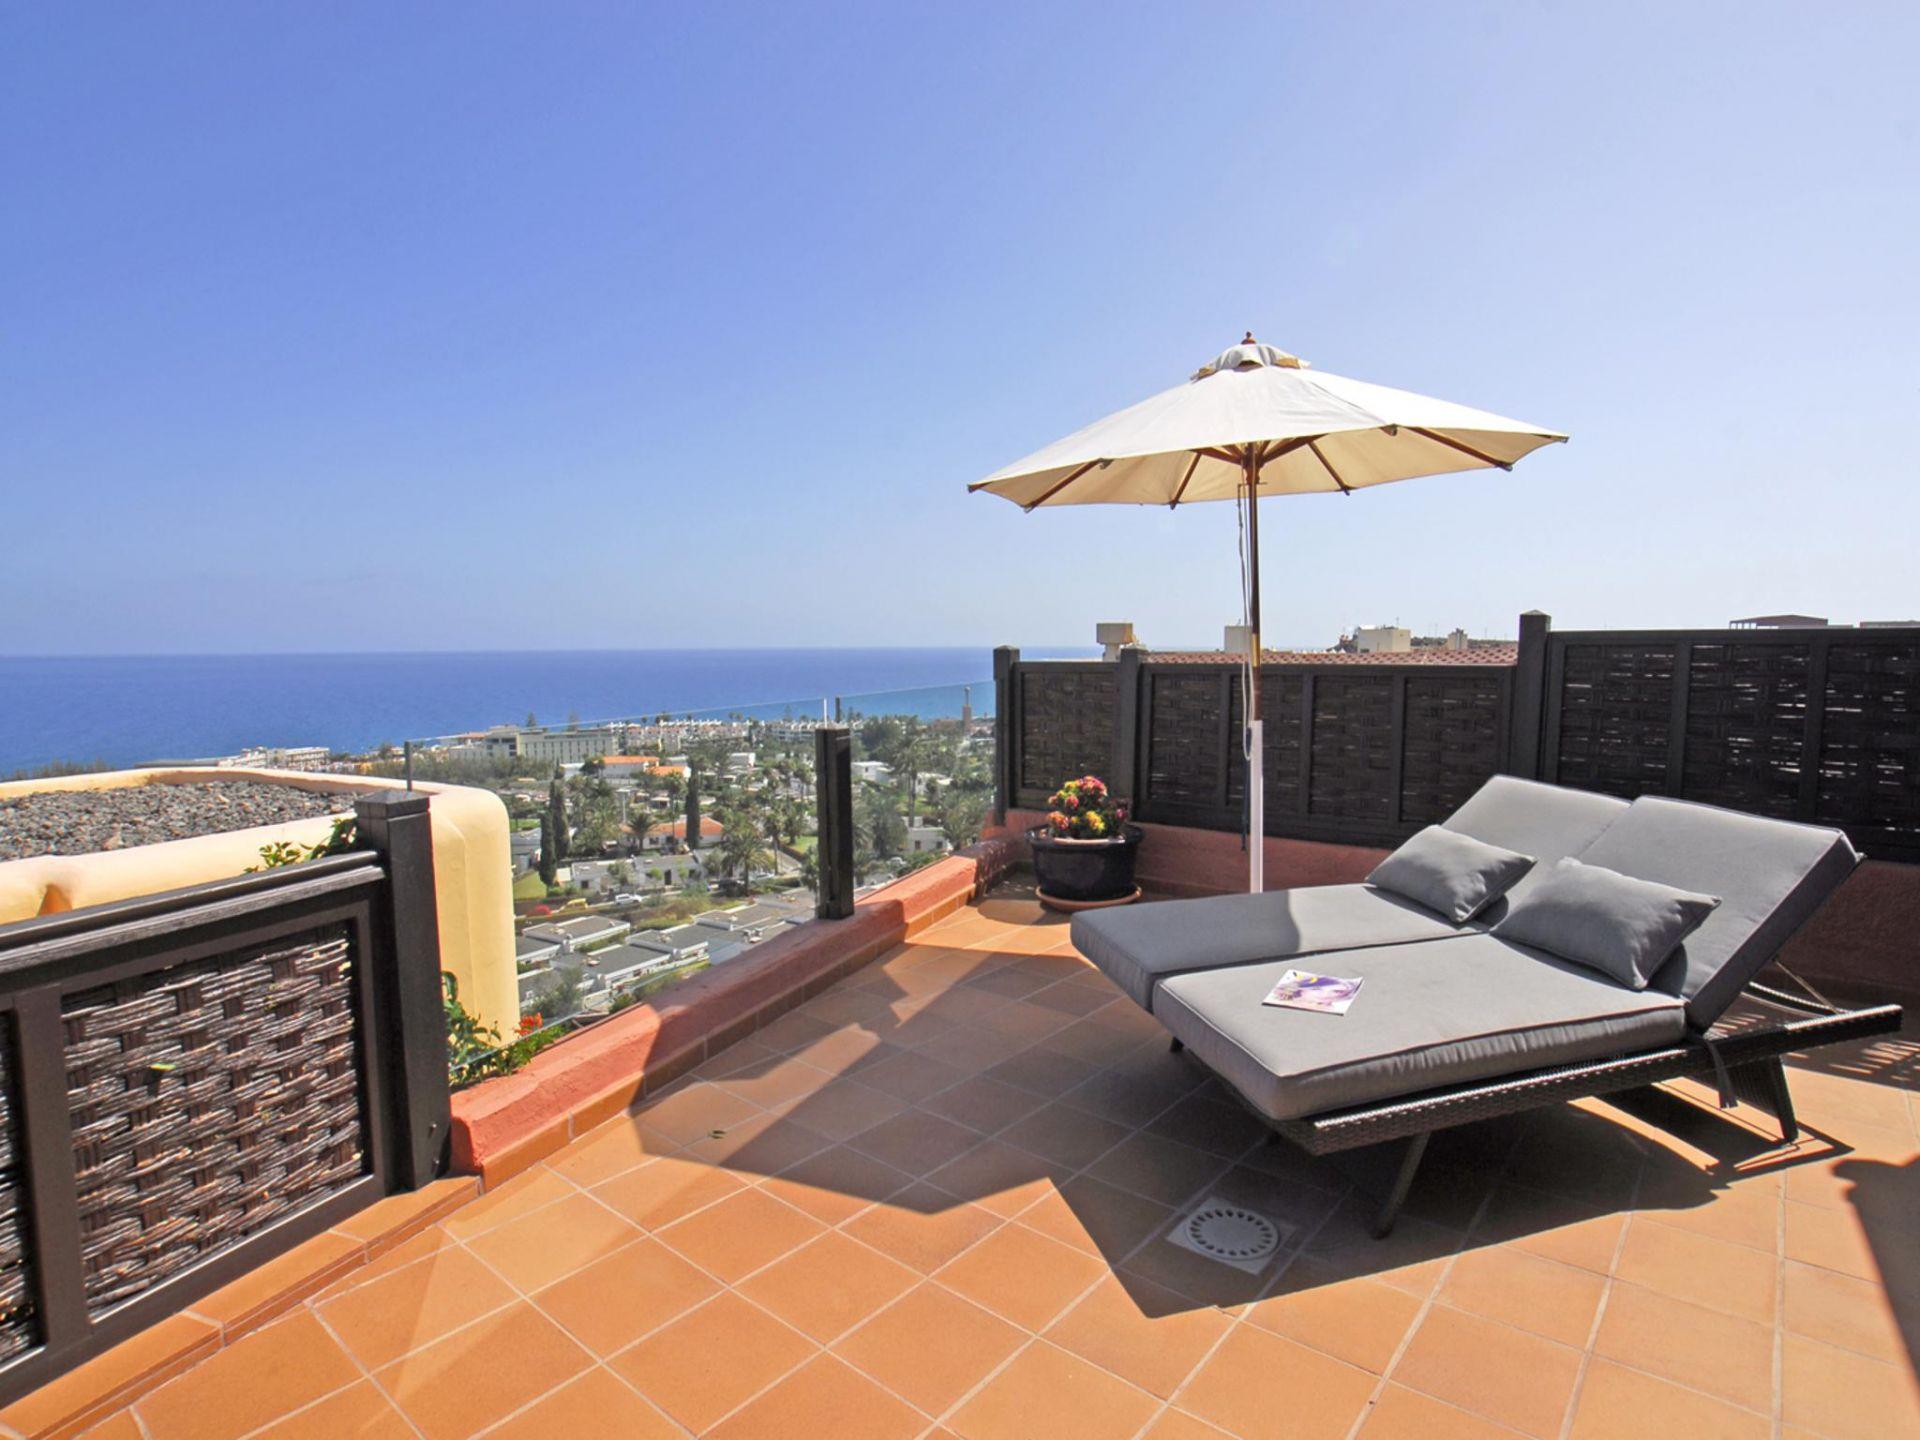 Holiday apartment Villa San Agustin 10 - Holiday Rental (854295), Maspalomas, Gran Canaria, Canary Islands, Spain, picture 3